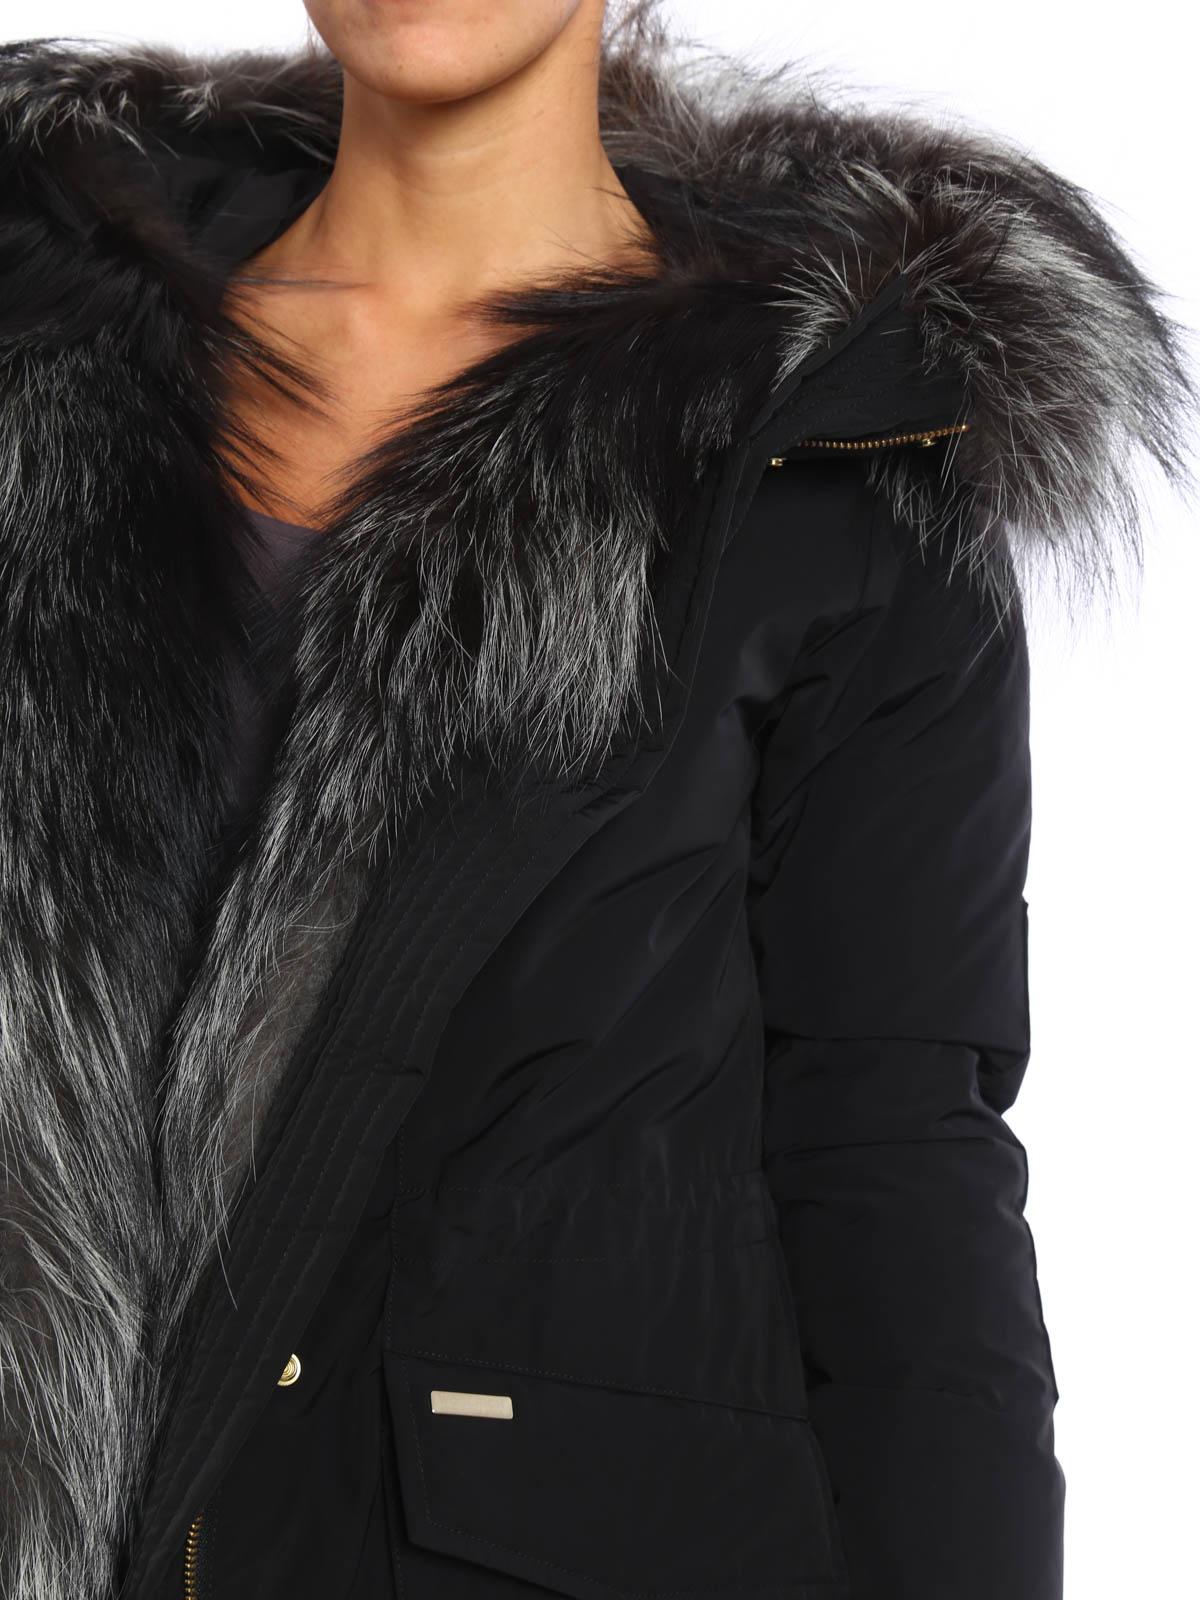 lowest price 87820 0b60c Woolrich - Fox fur military parka - parkas - WWCPS2385 SM20 100